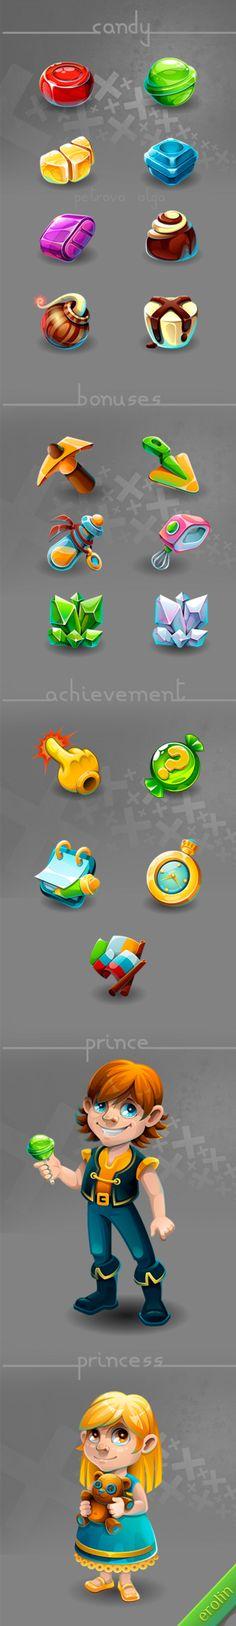 Game icon(776图)_@明年-an收集_花瓣UI/UX